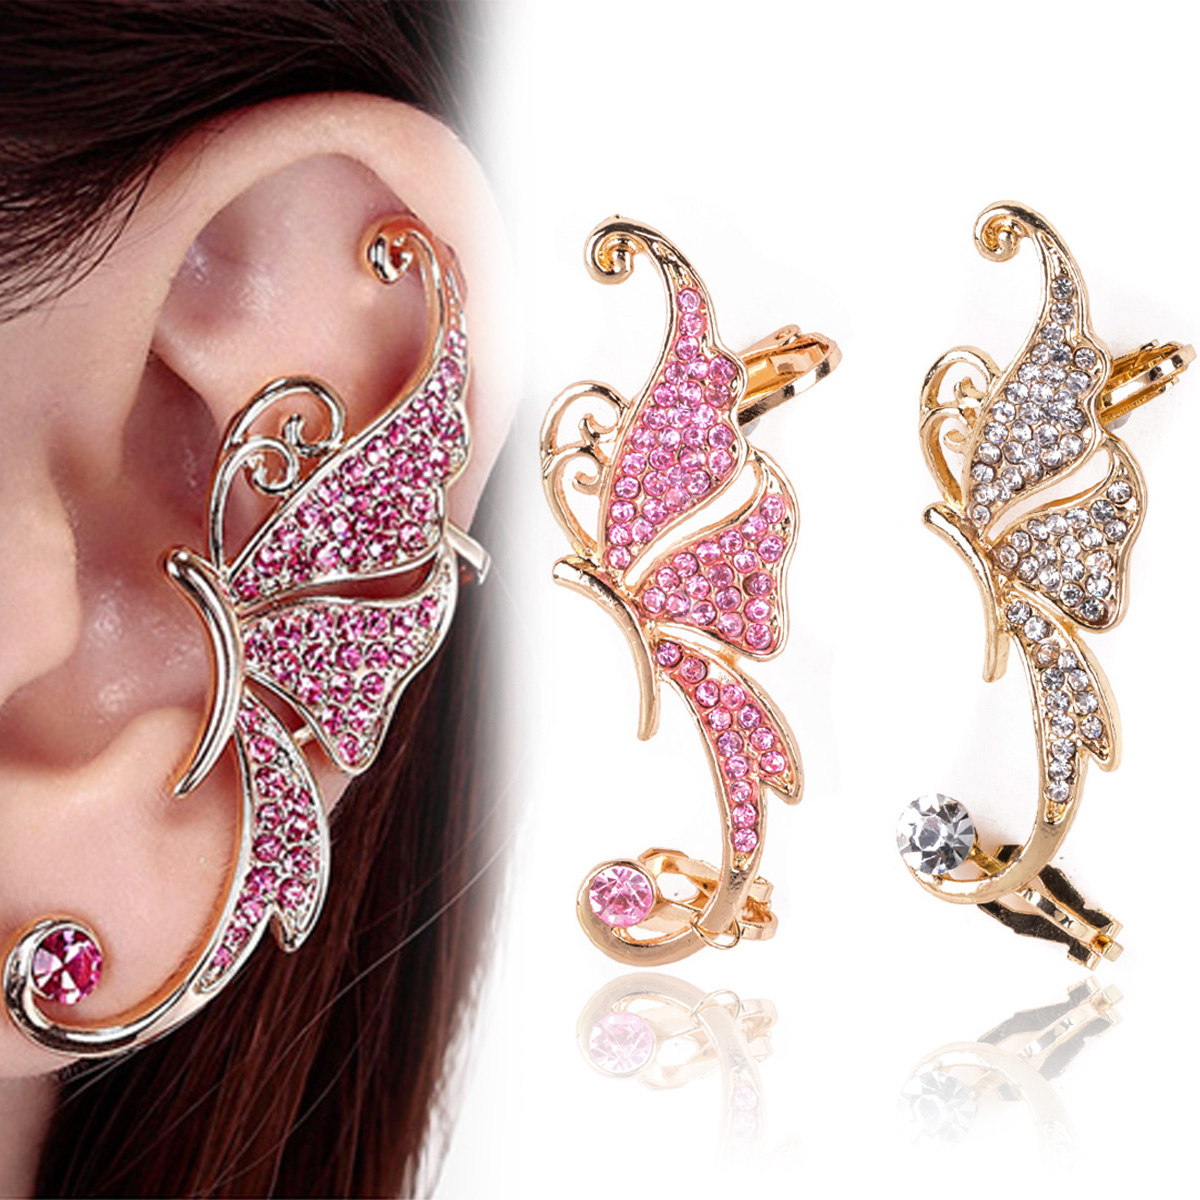 1pcs Fashion Cute Butterfly Rhinestone Crystal Butterfly Ear Cuff Clip  Cartilage Earring For Women Jewelry Gift